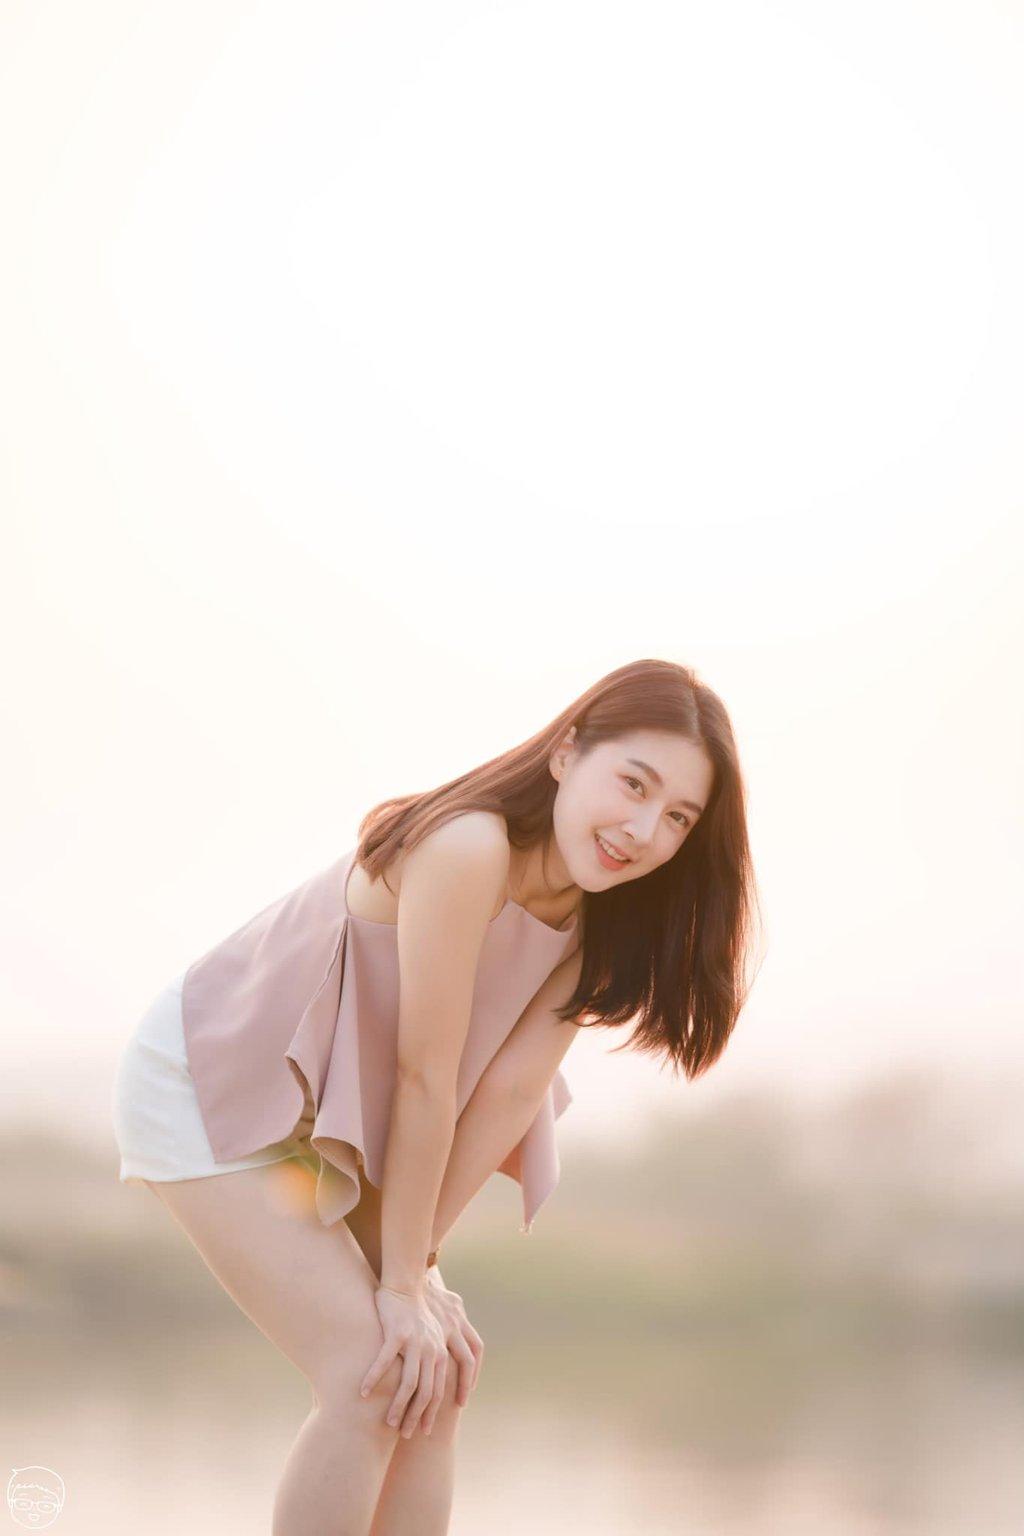 Image Thailand Model - Namlom Homhuan - Sweet Pink - TruePic.net - Picture-3